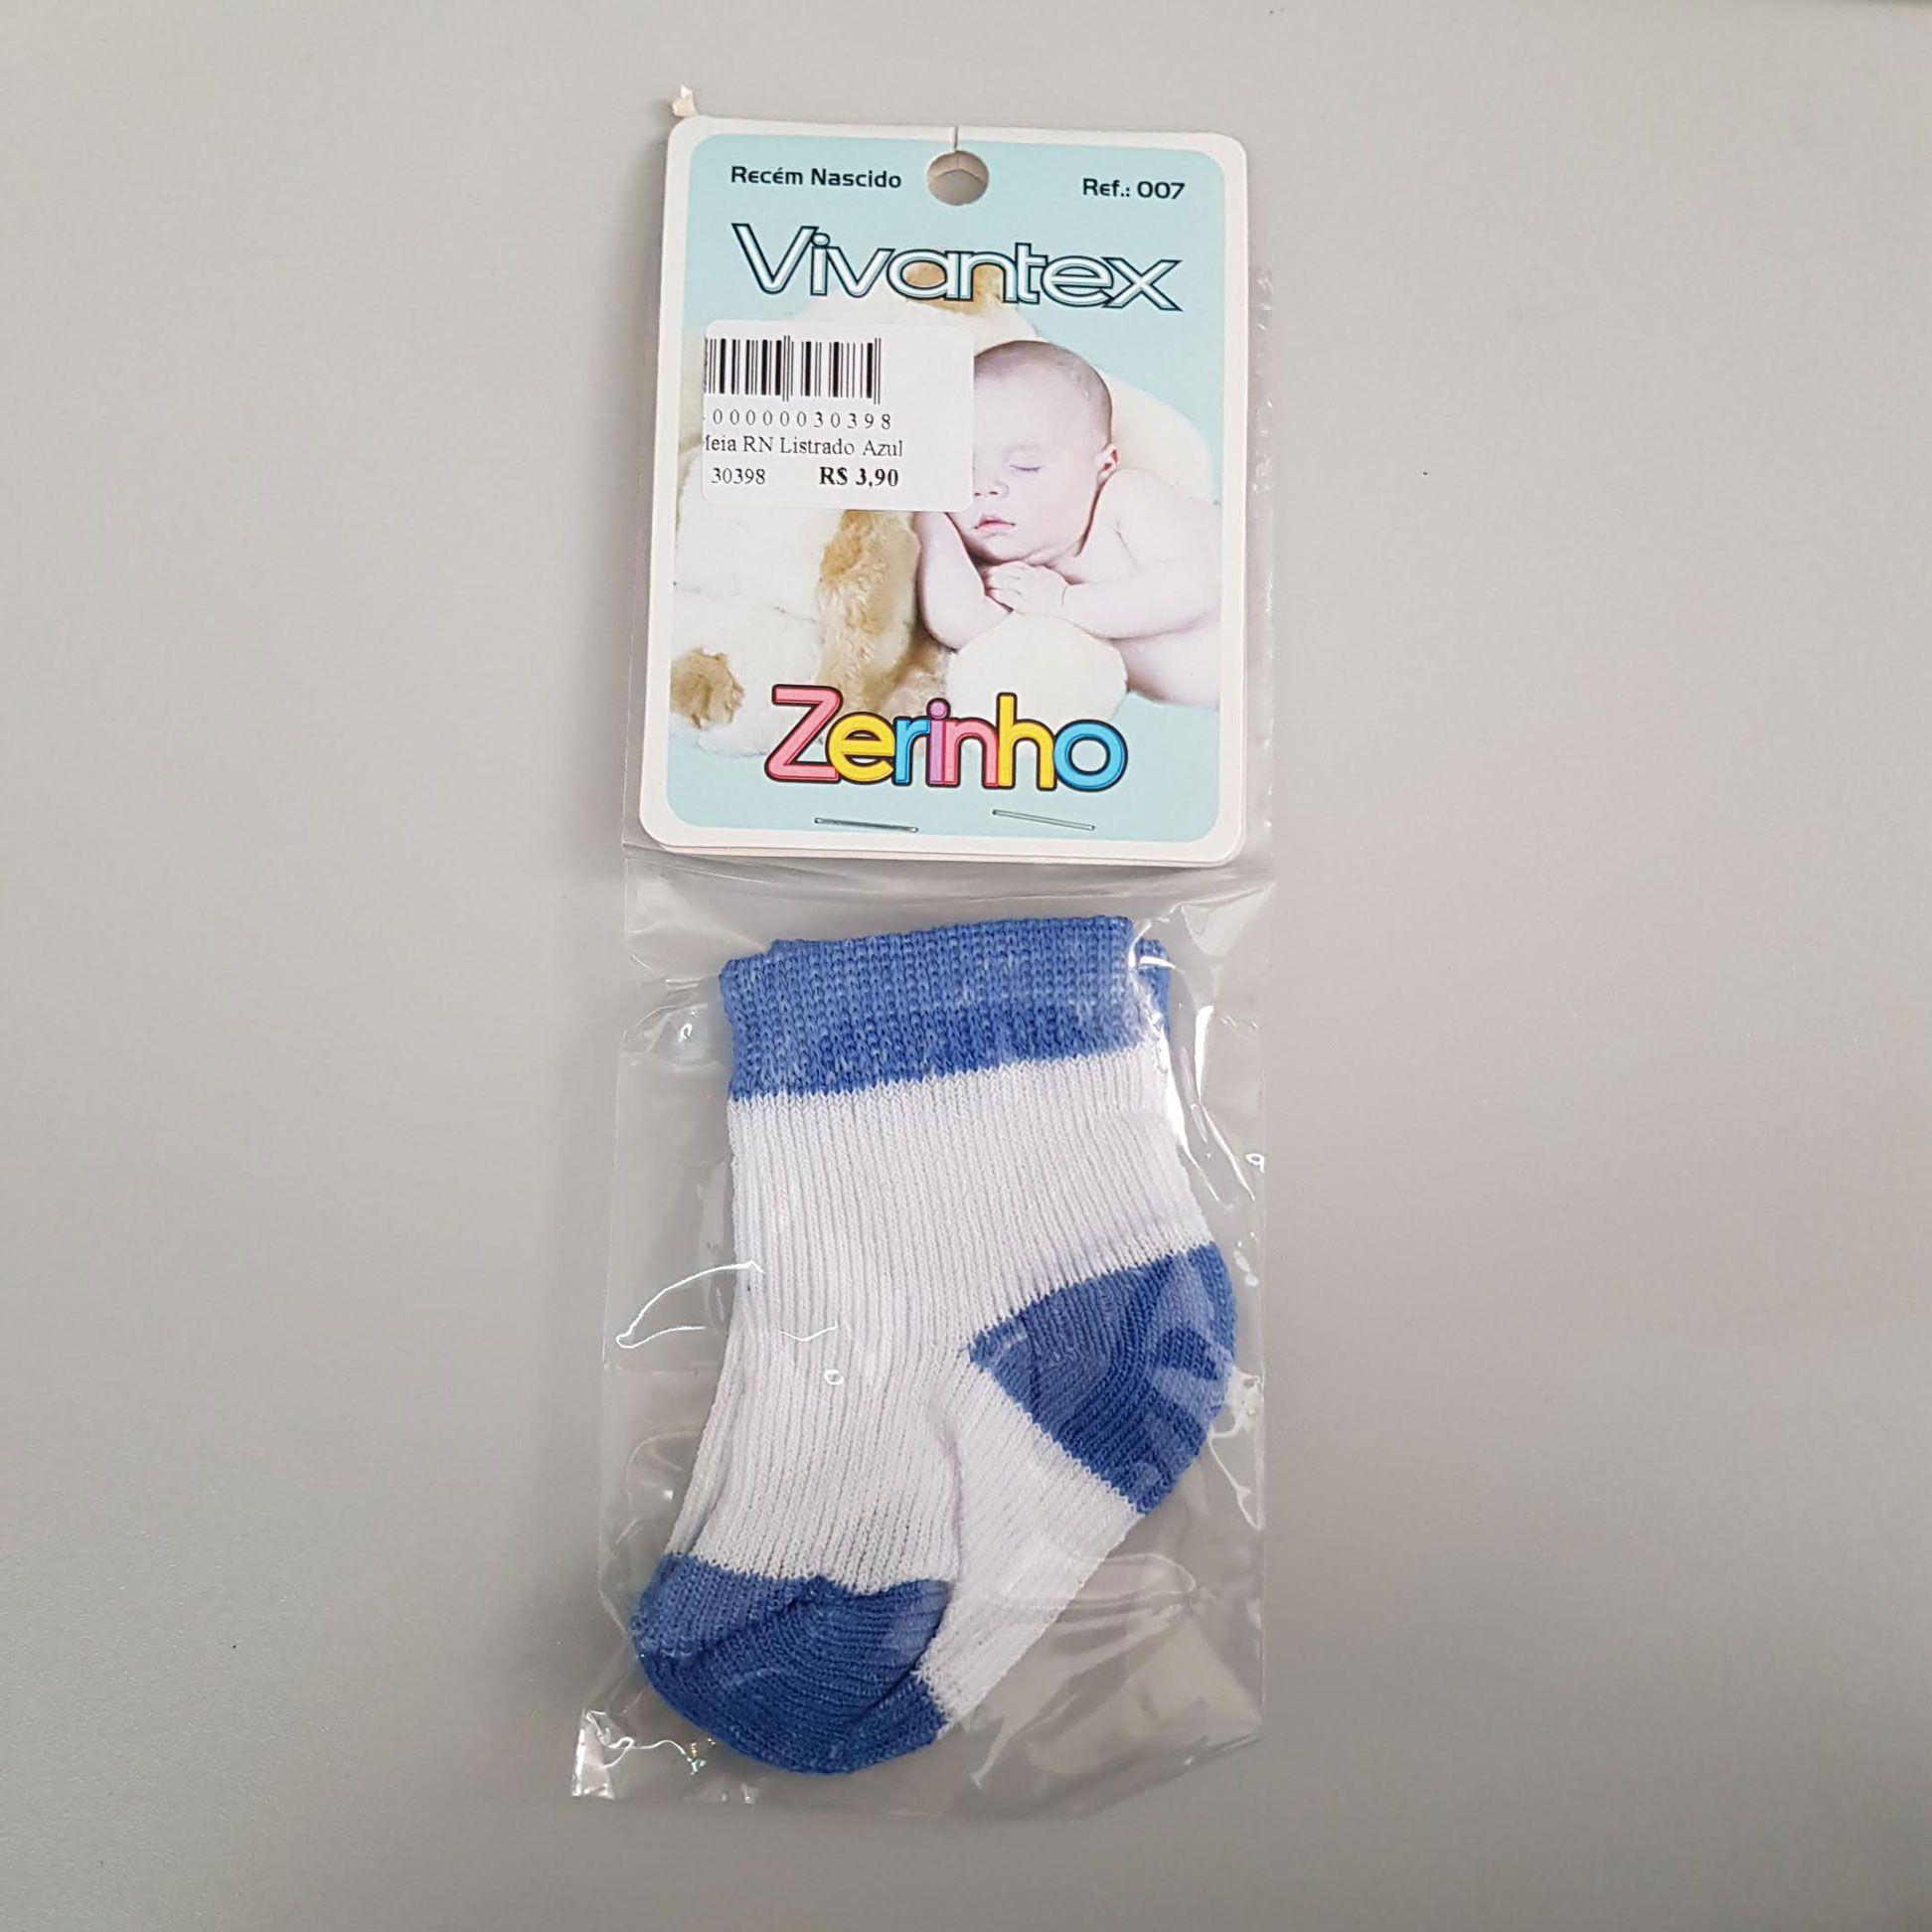 Meia Infantil RN 1 par Branco e Azul Escuro - Vivantex